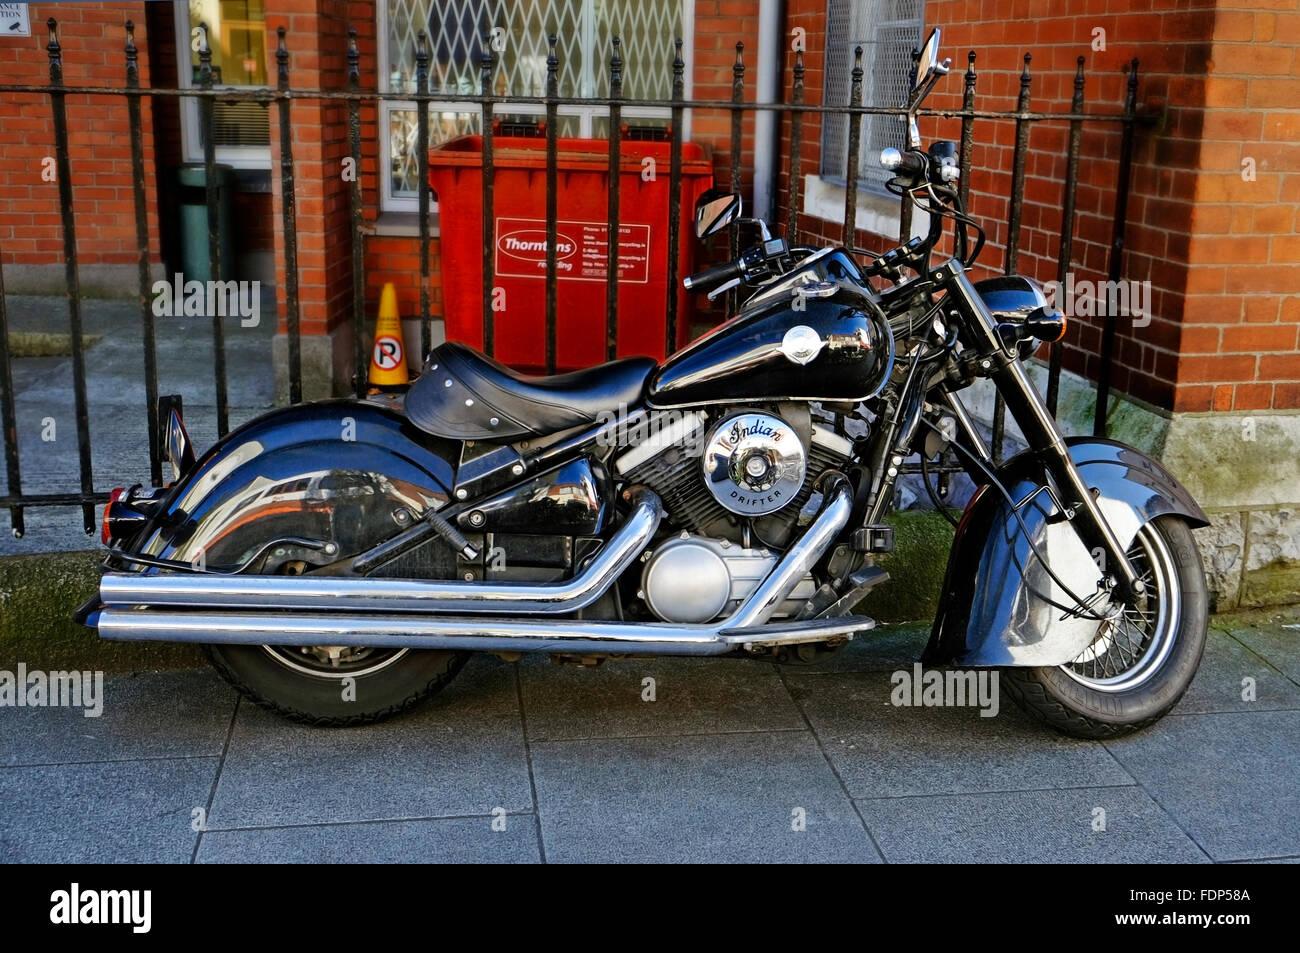 Large Motorcycle Kawasaki Indian Drifter Vee twin dark blue Dublin Ireland - Stock Image